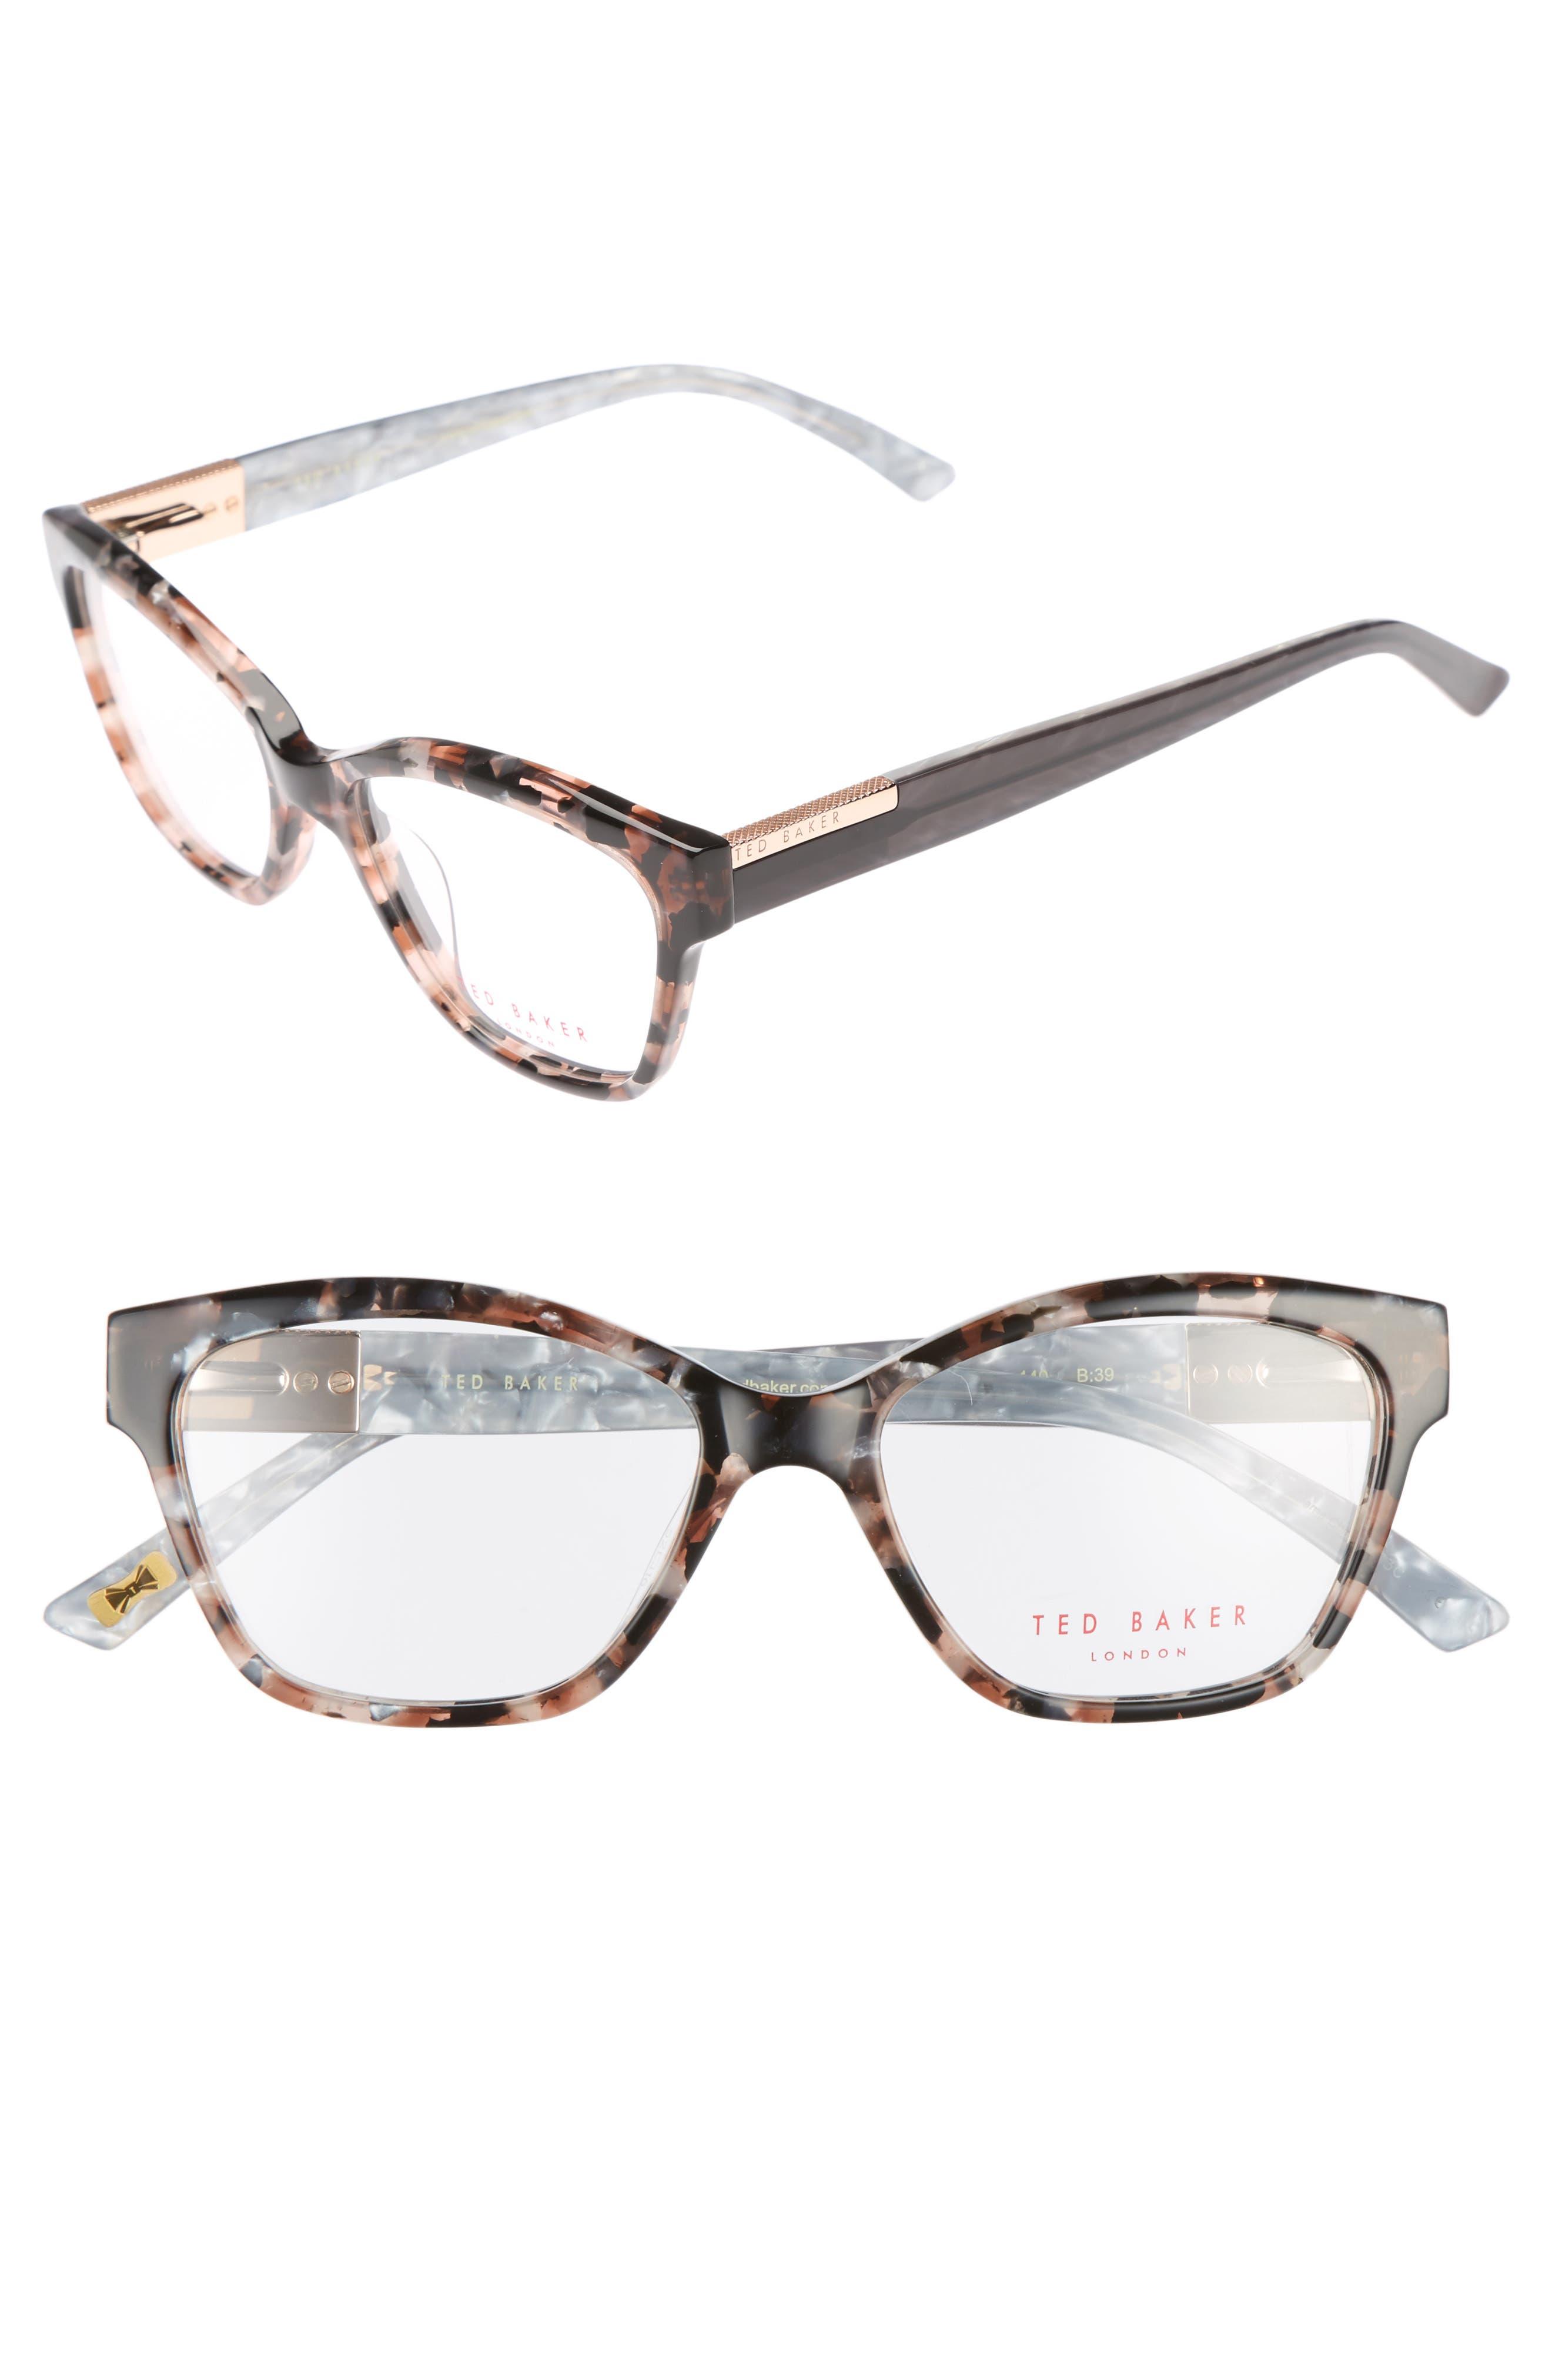 52mm Optical Cat Eye Glasses,                         Main,                         color, 650